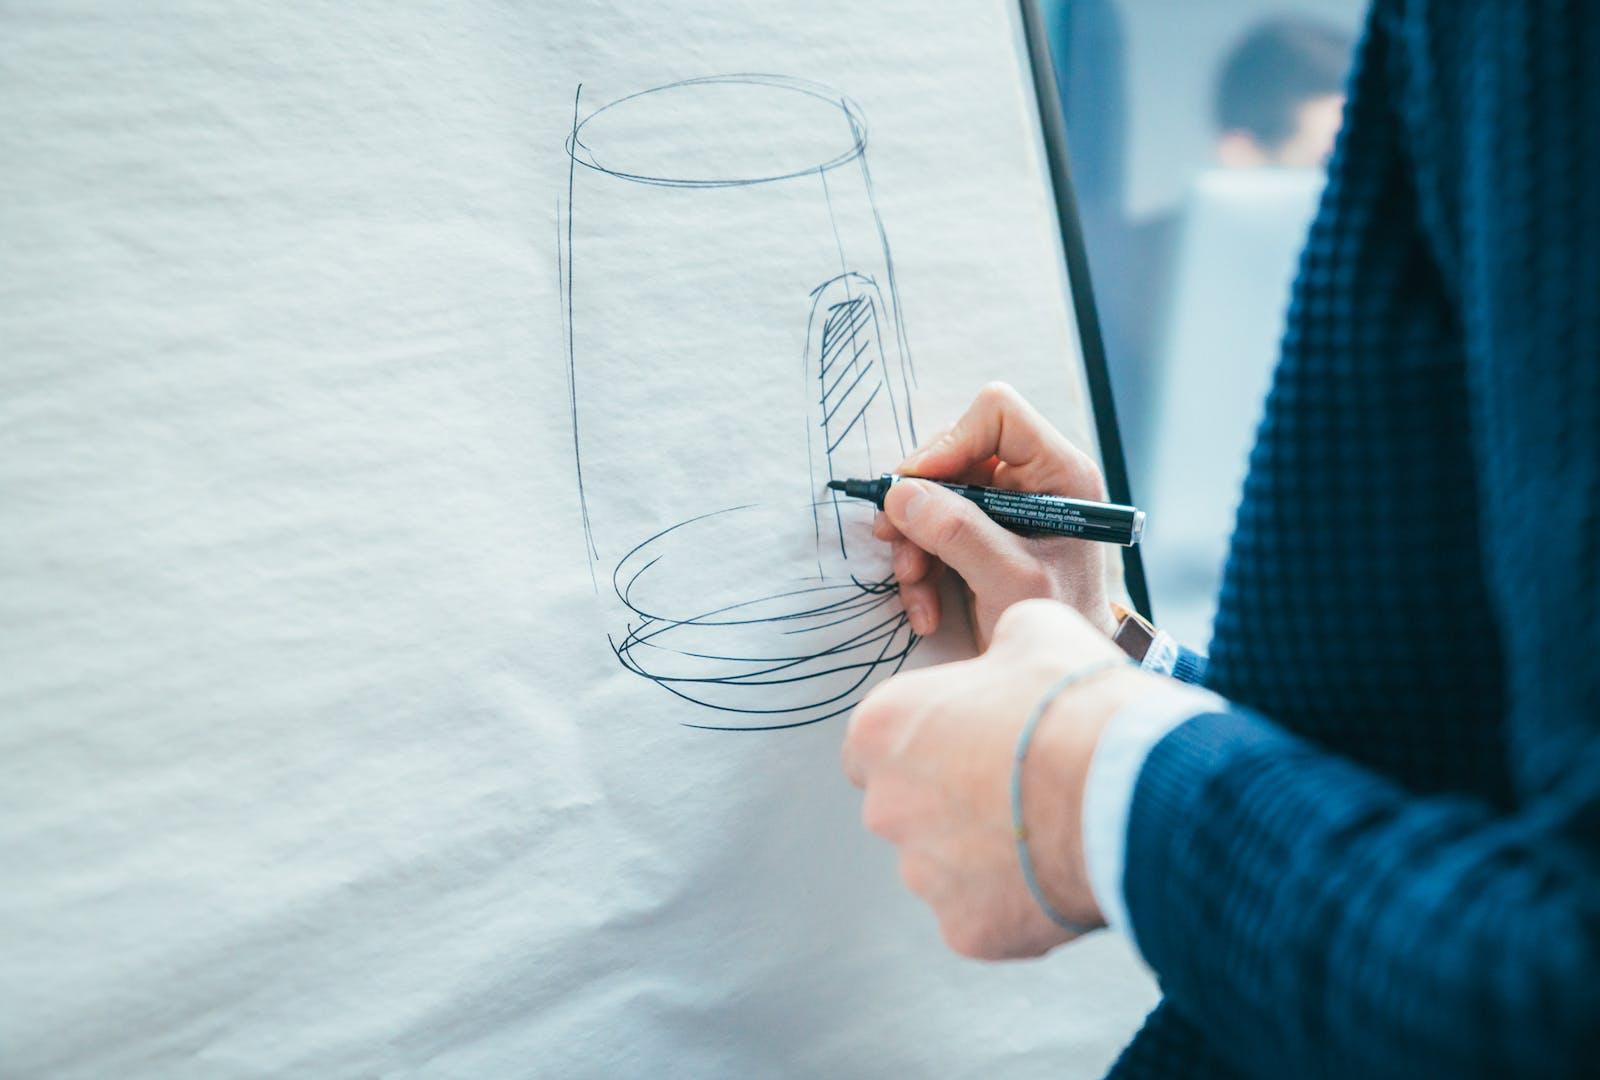 Design Thinking behind Natede